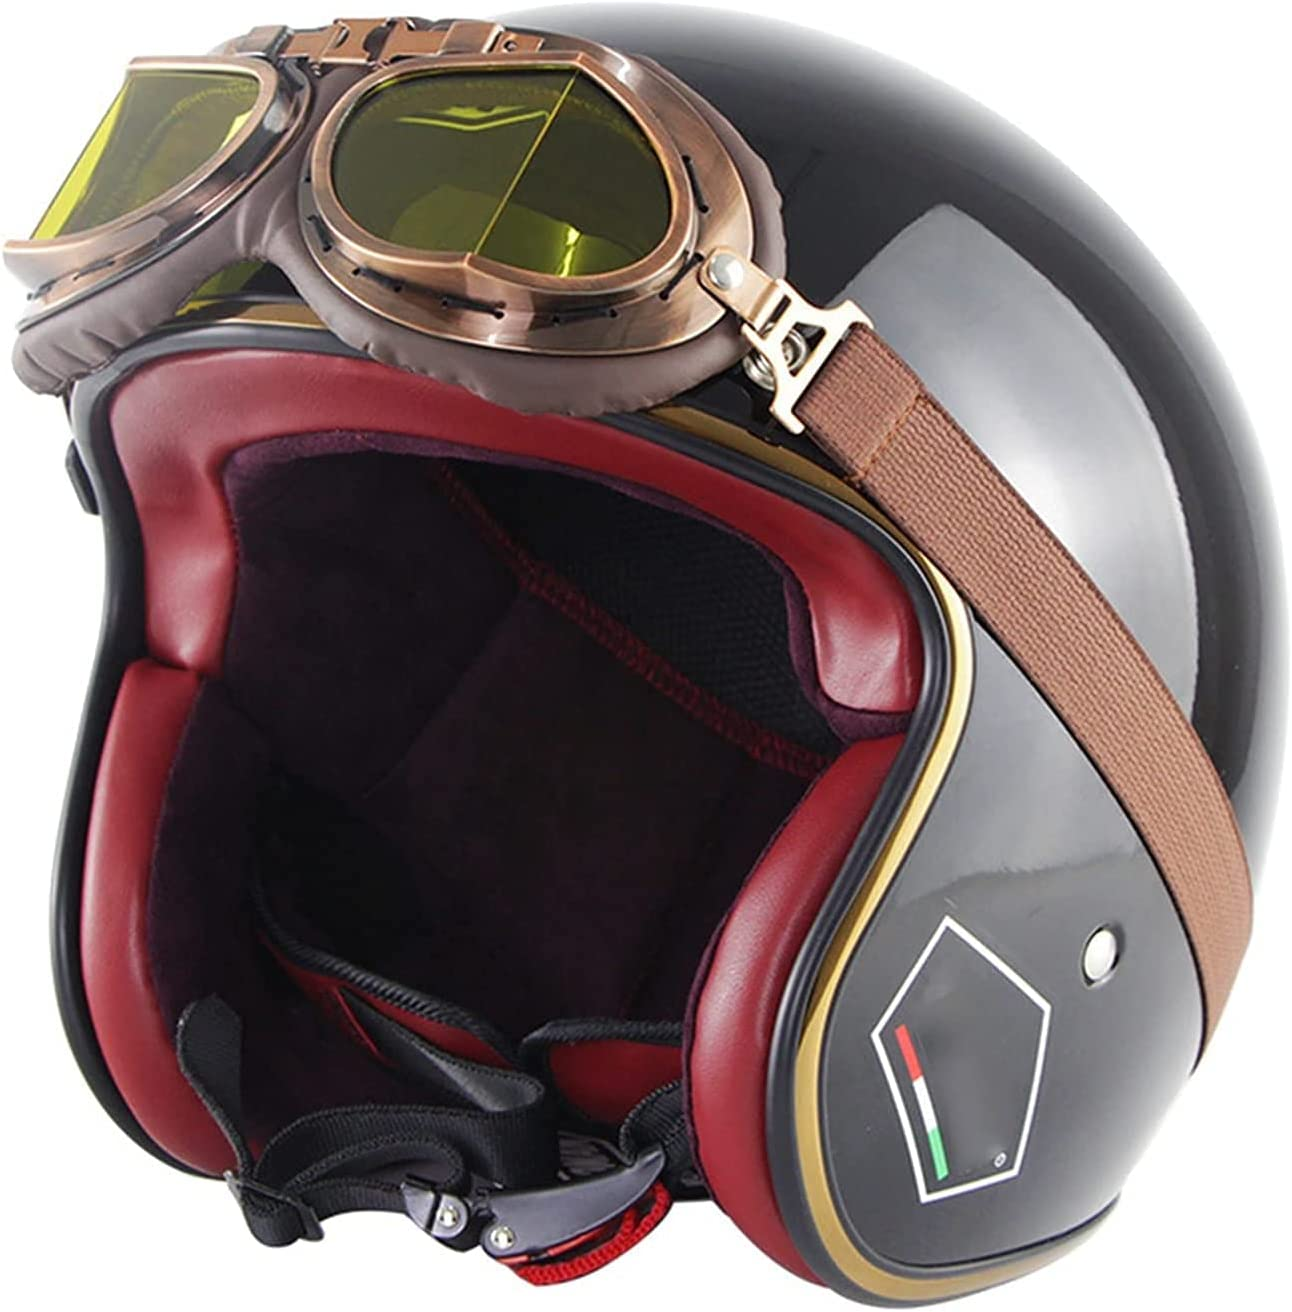 TYYCKJ Branded goods Touring Motorcycle Half O Save money Vintage Motorbike Helmet